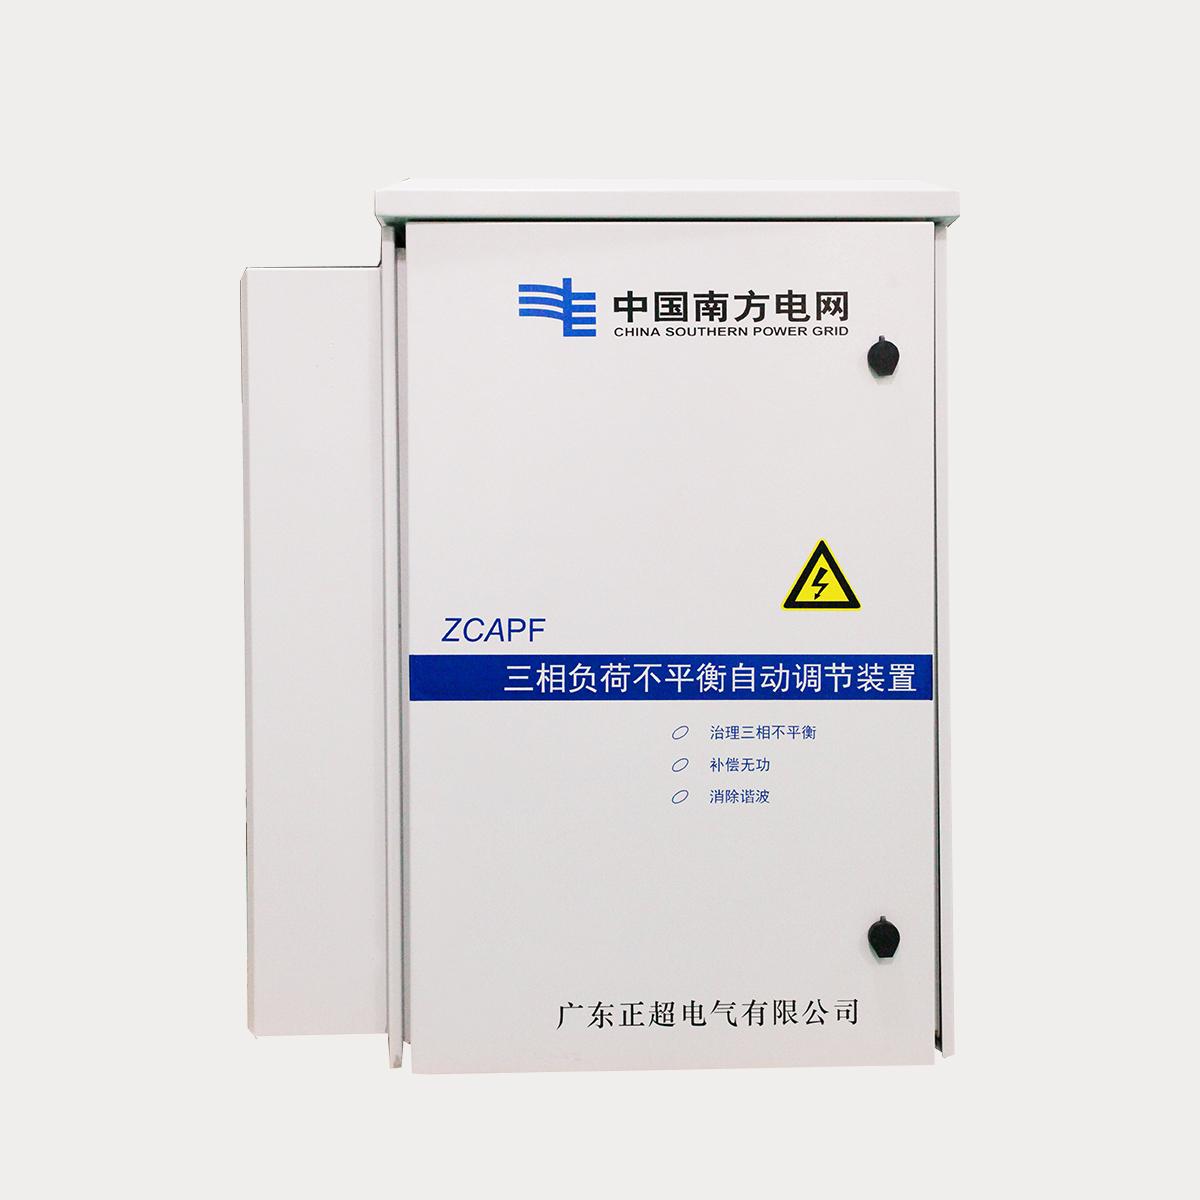 ZCAPF三相负荷不平衡自动调节装置